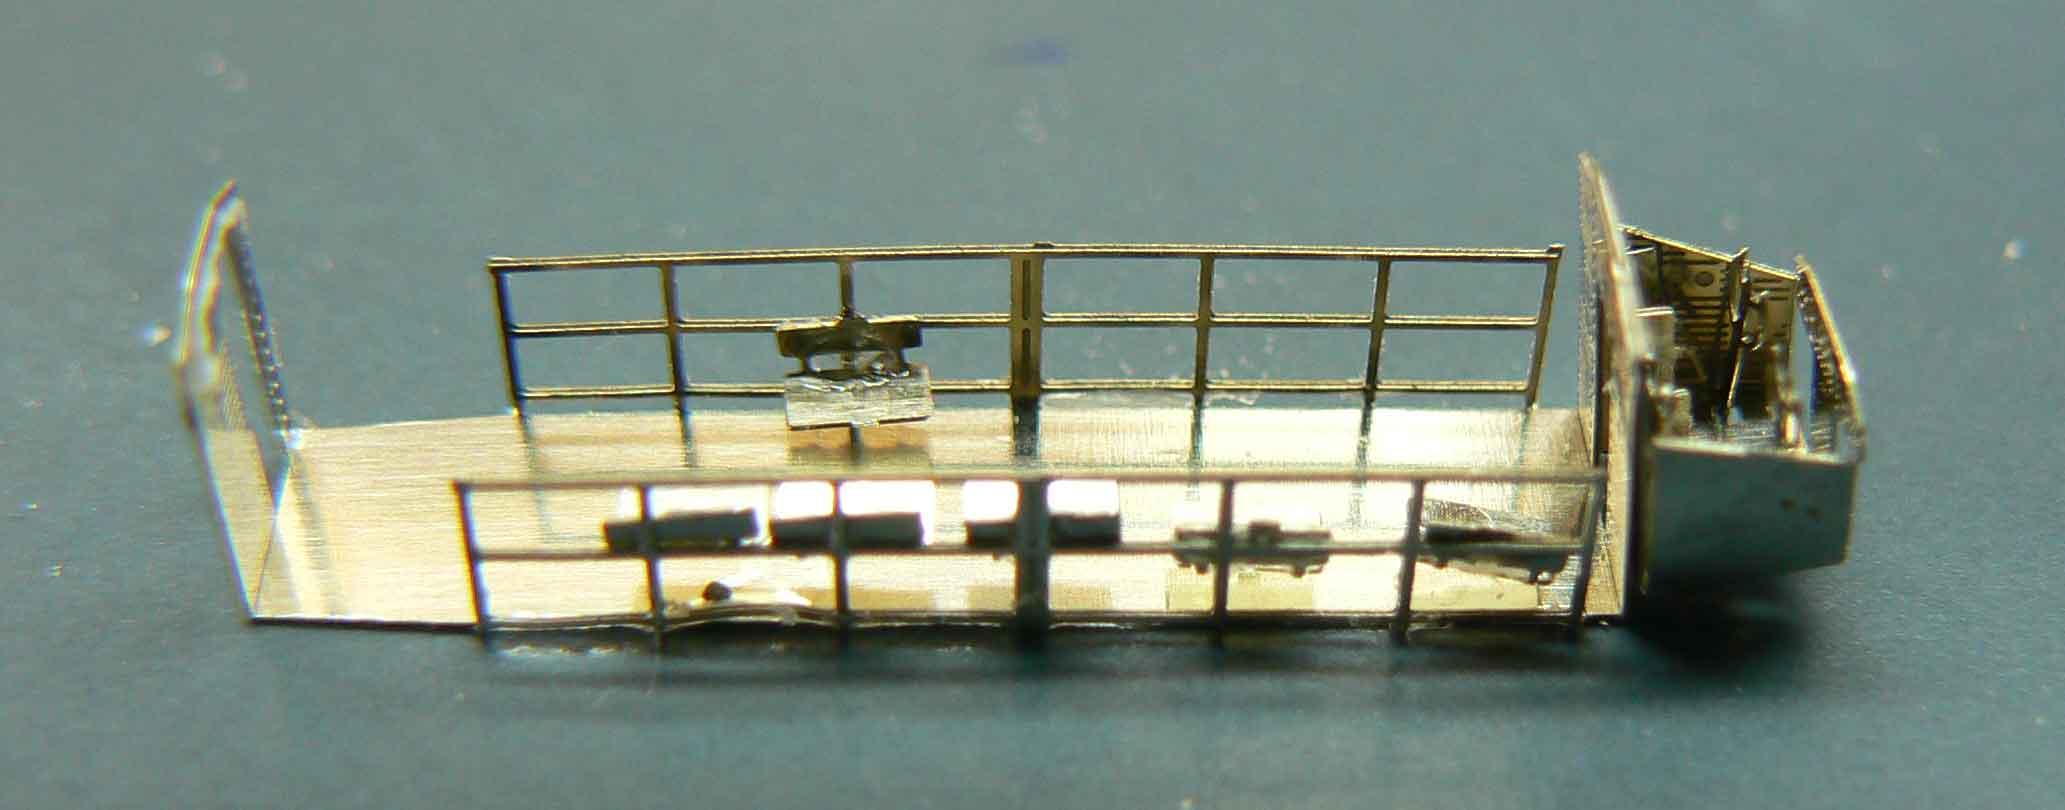 JU 52 1/350 en photodécoupe GxFfD4